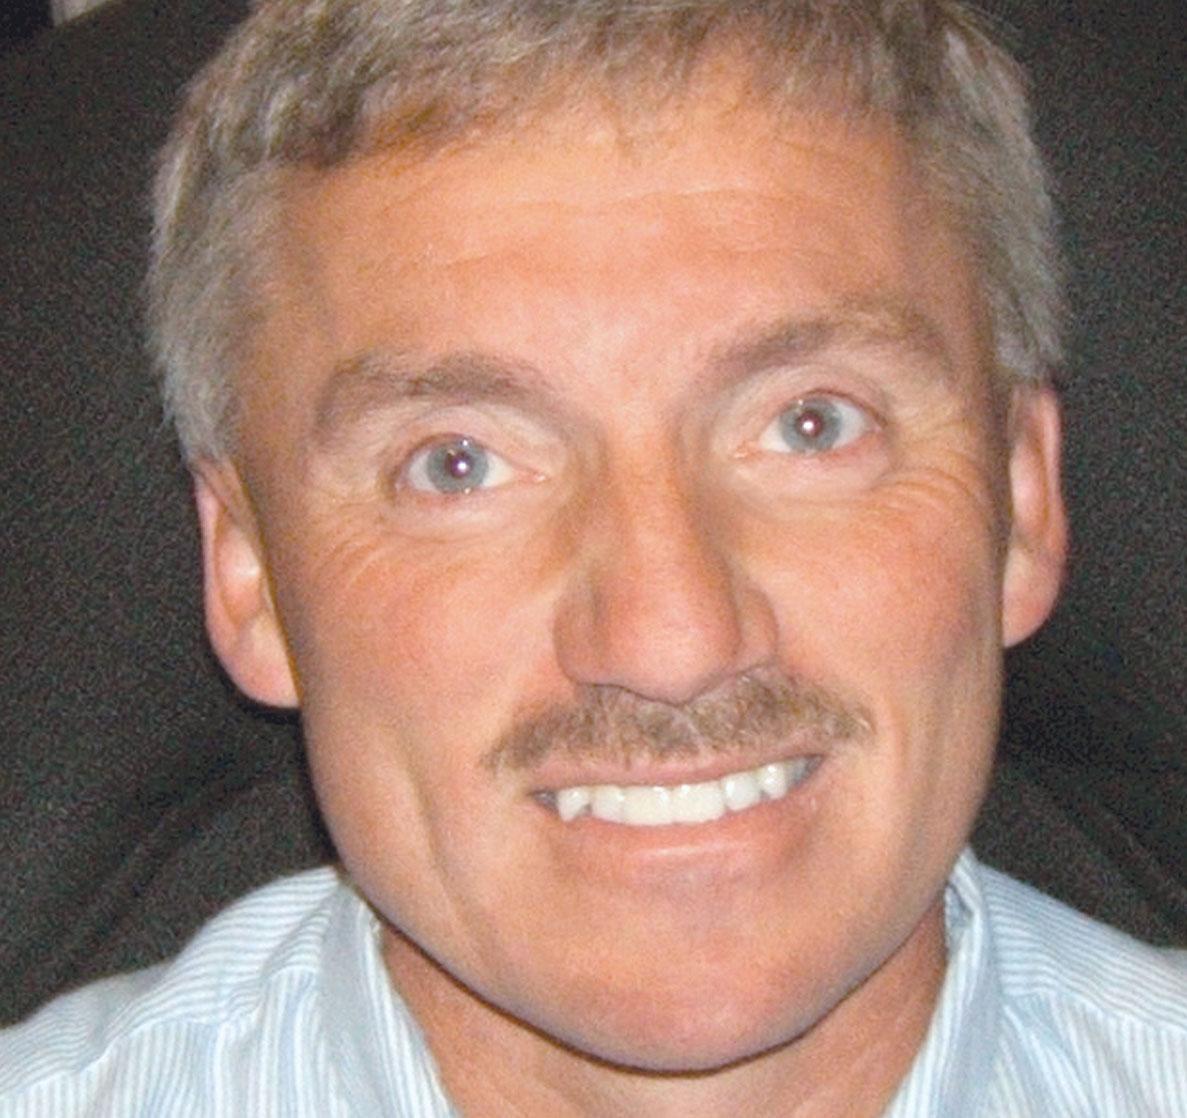 Lenny Van Loon - Conseiller en nutrition laitière - Dairy Nutrition Advisor